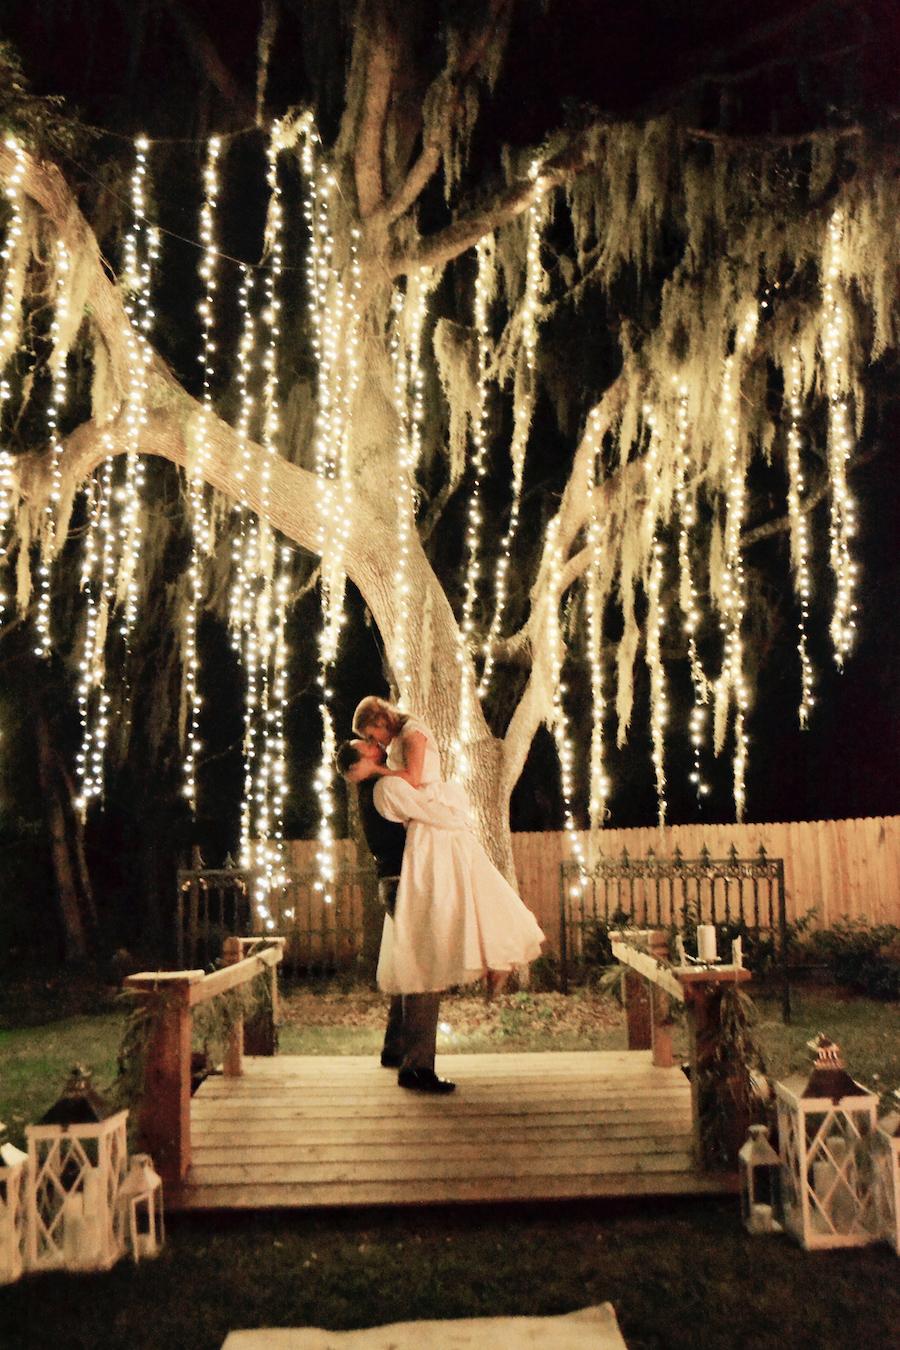 Sarasota Outdoor Bride and Groom Nighttime Portrait on Wedding Day | Sarasota Wedding Venue Bakers Ranch